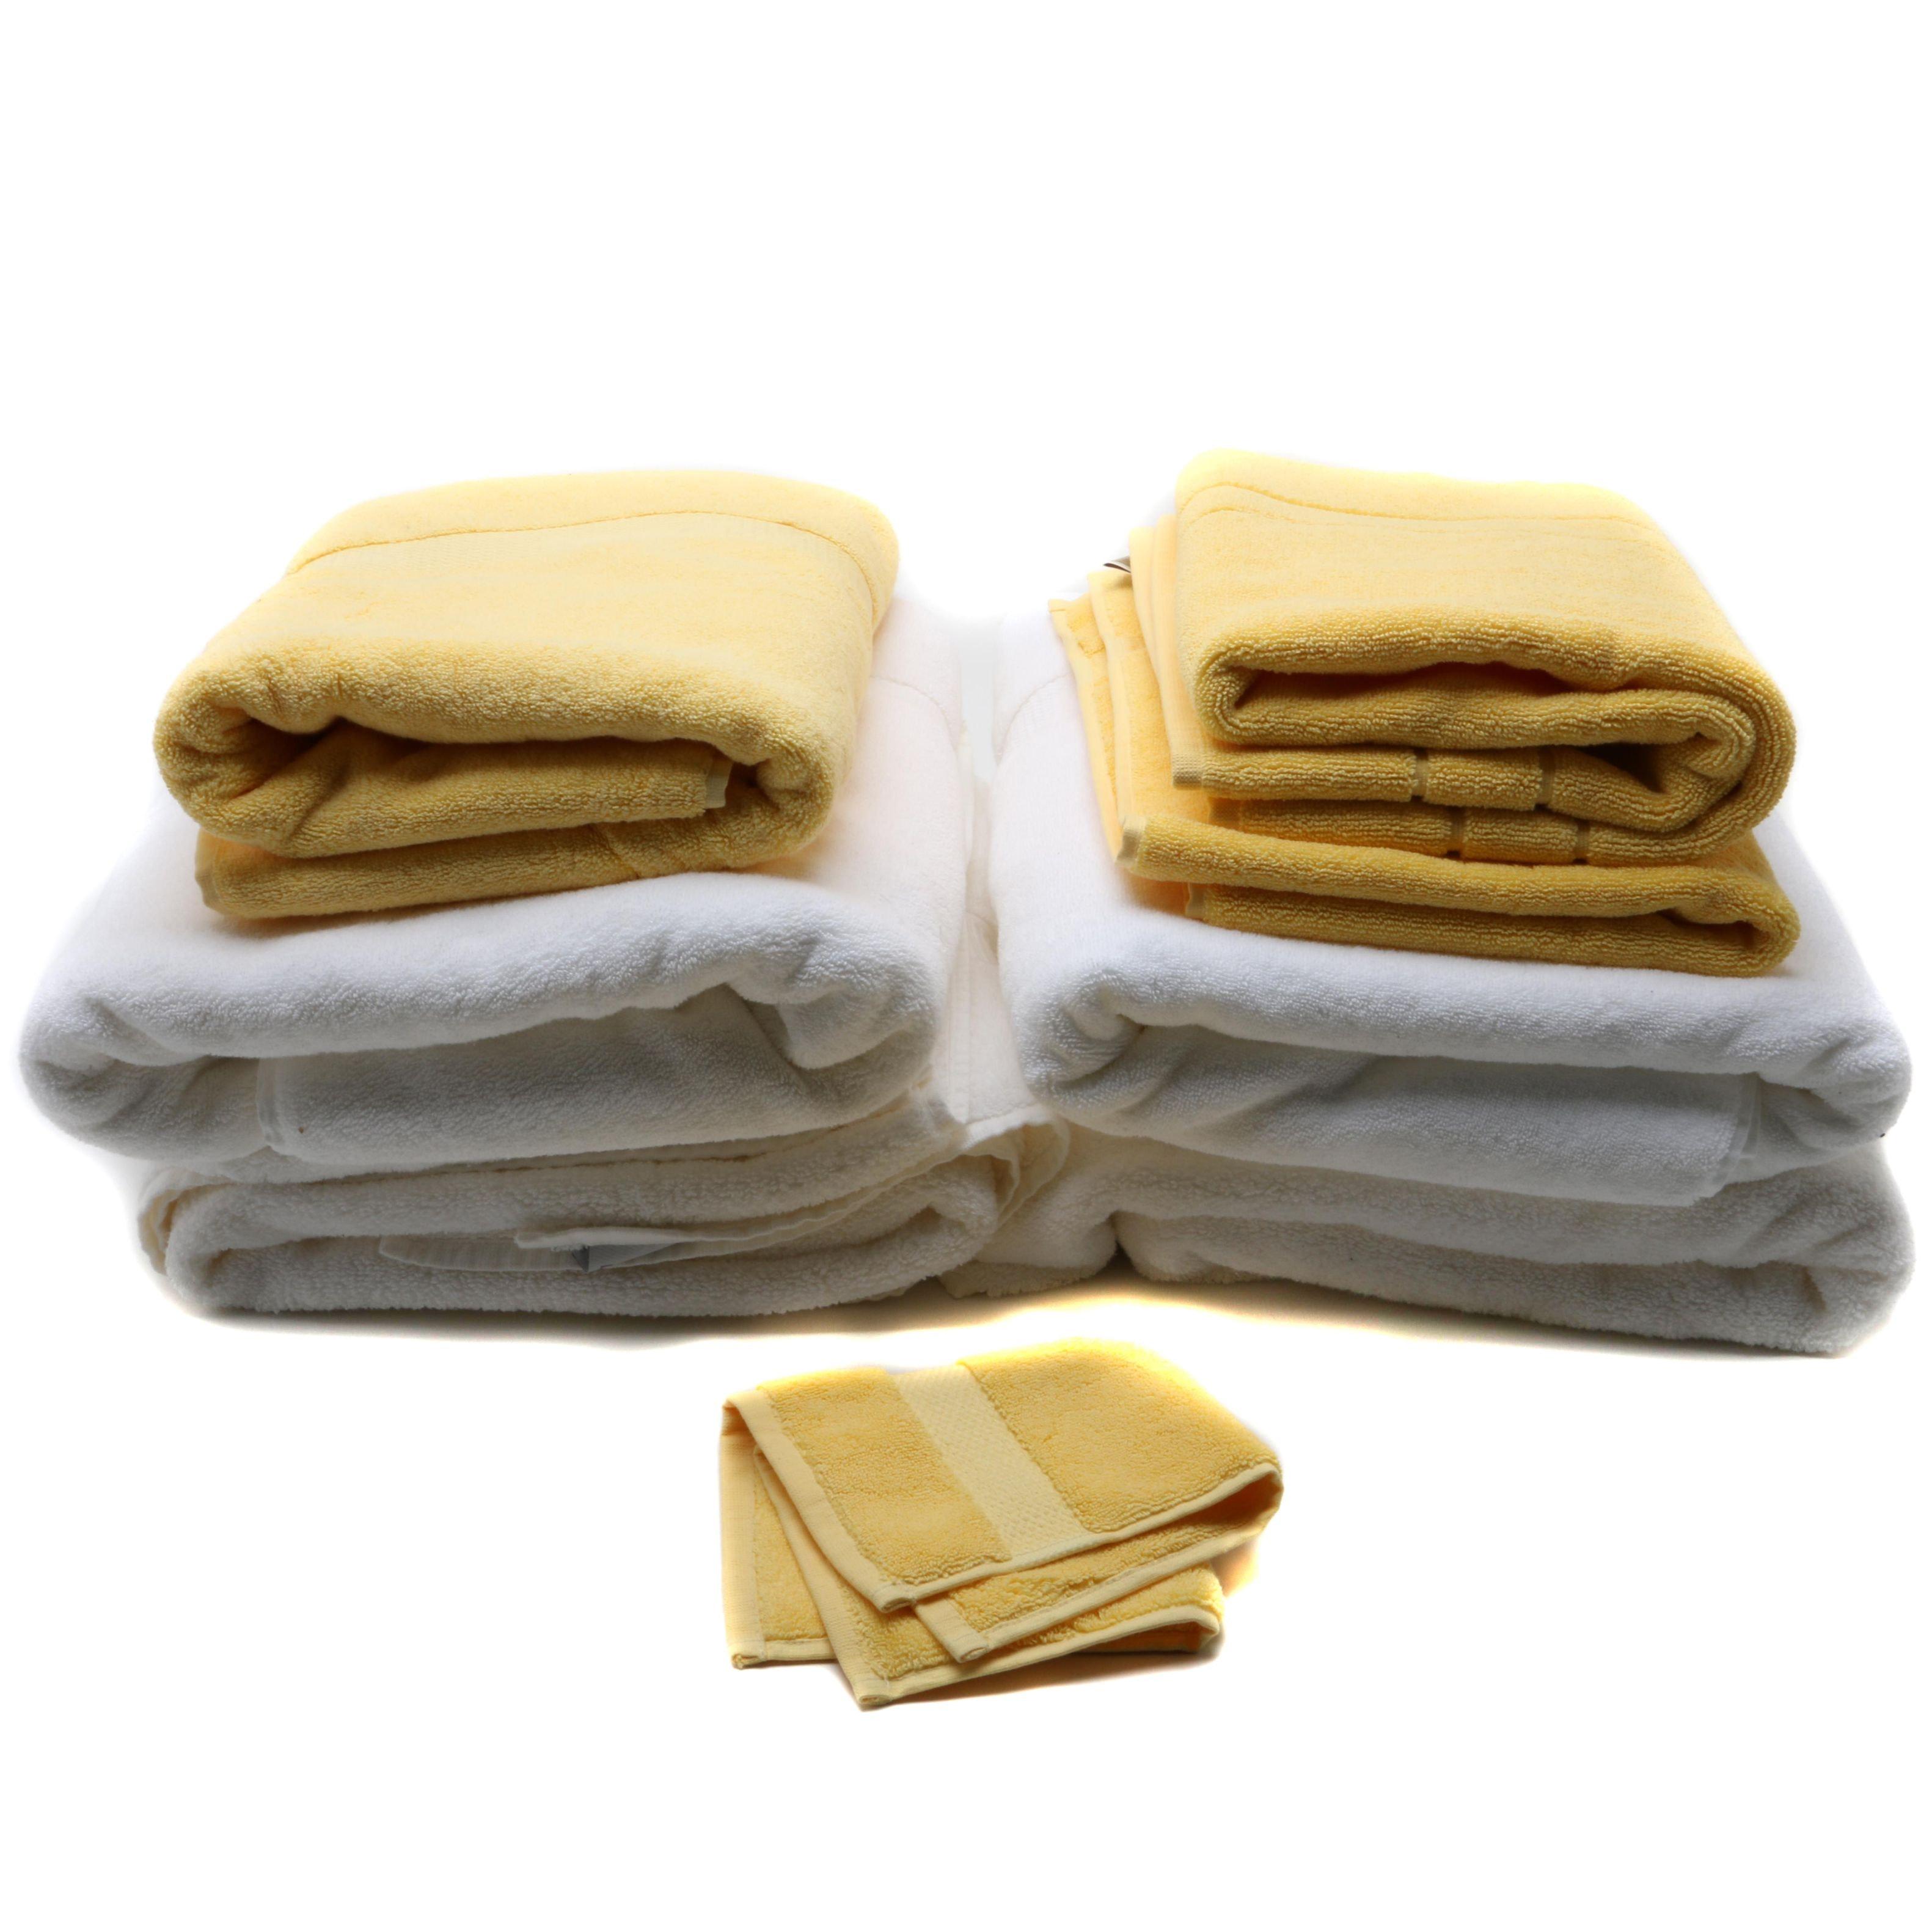 Bath Towels Featuring Restoration Hardware